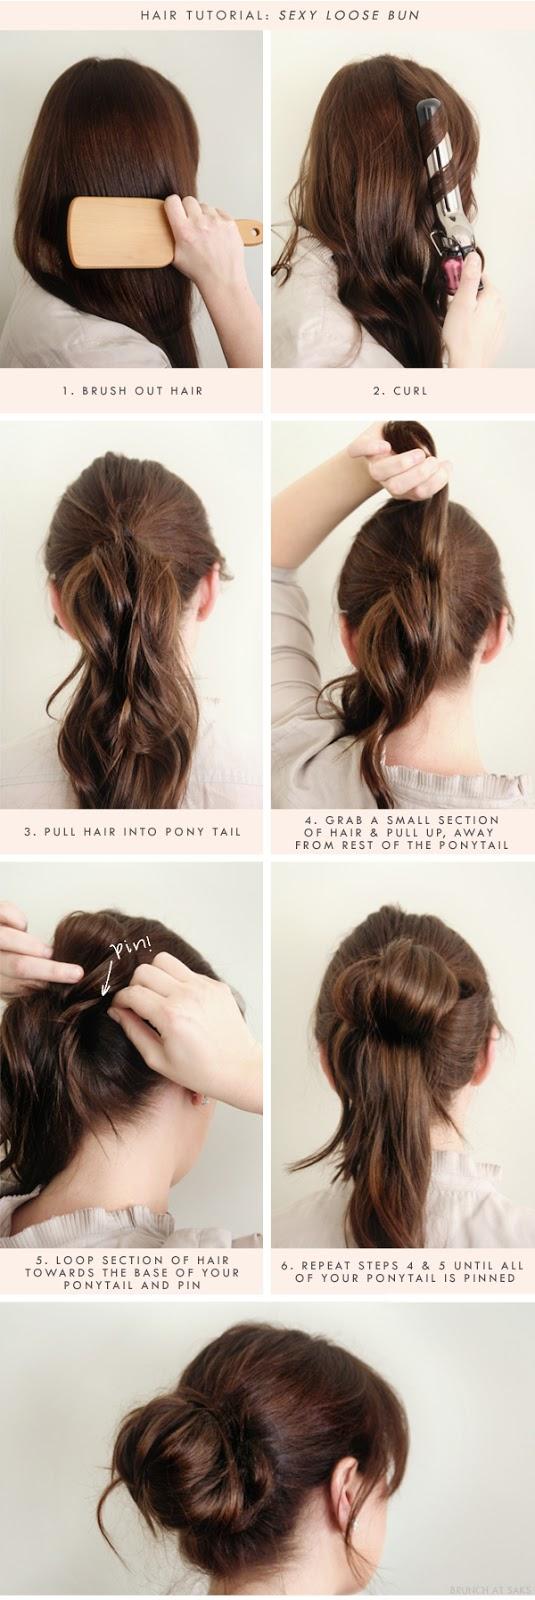 Sensational Top 25 Messy Hair Bun Tutorials Perfect For Those Lazy Mornings Short Hairstyles Gunalazisus